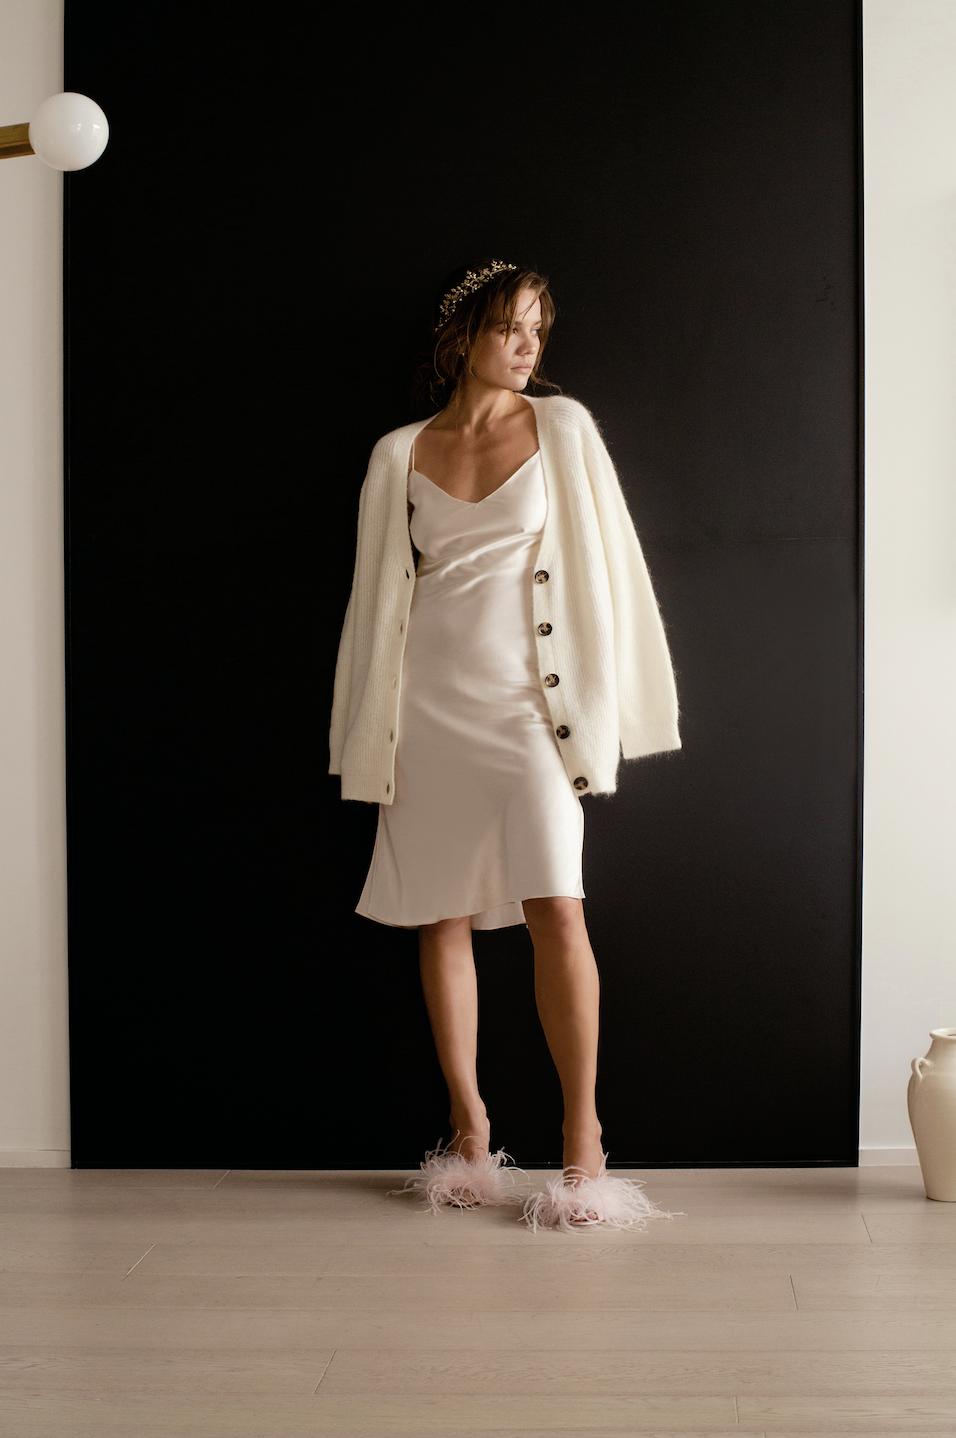 Silk Slip Silk Dress Layering White Silk Dress Elegant Silk Dress Elegant Slip Dress Slip Dre White Slip Dress Elegant Silk Dresses Slip Dress Outfit [ 1438 x 956 Pixel ]